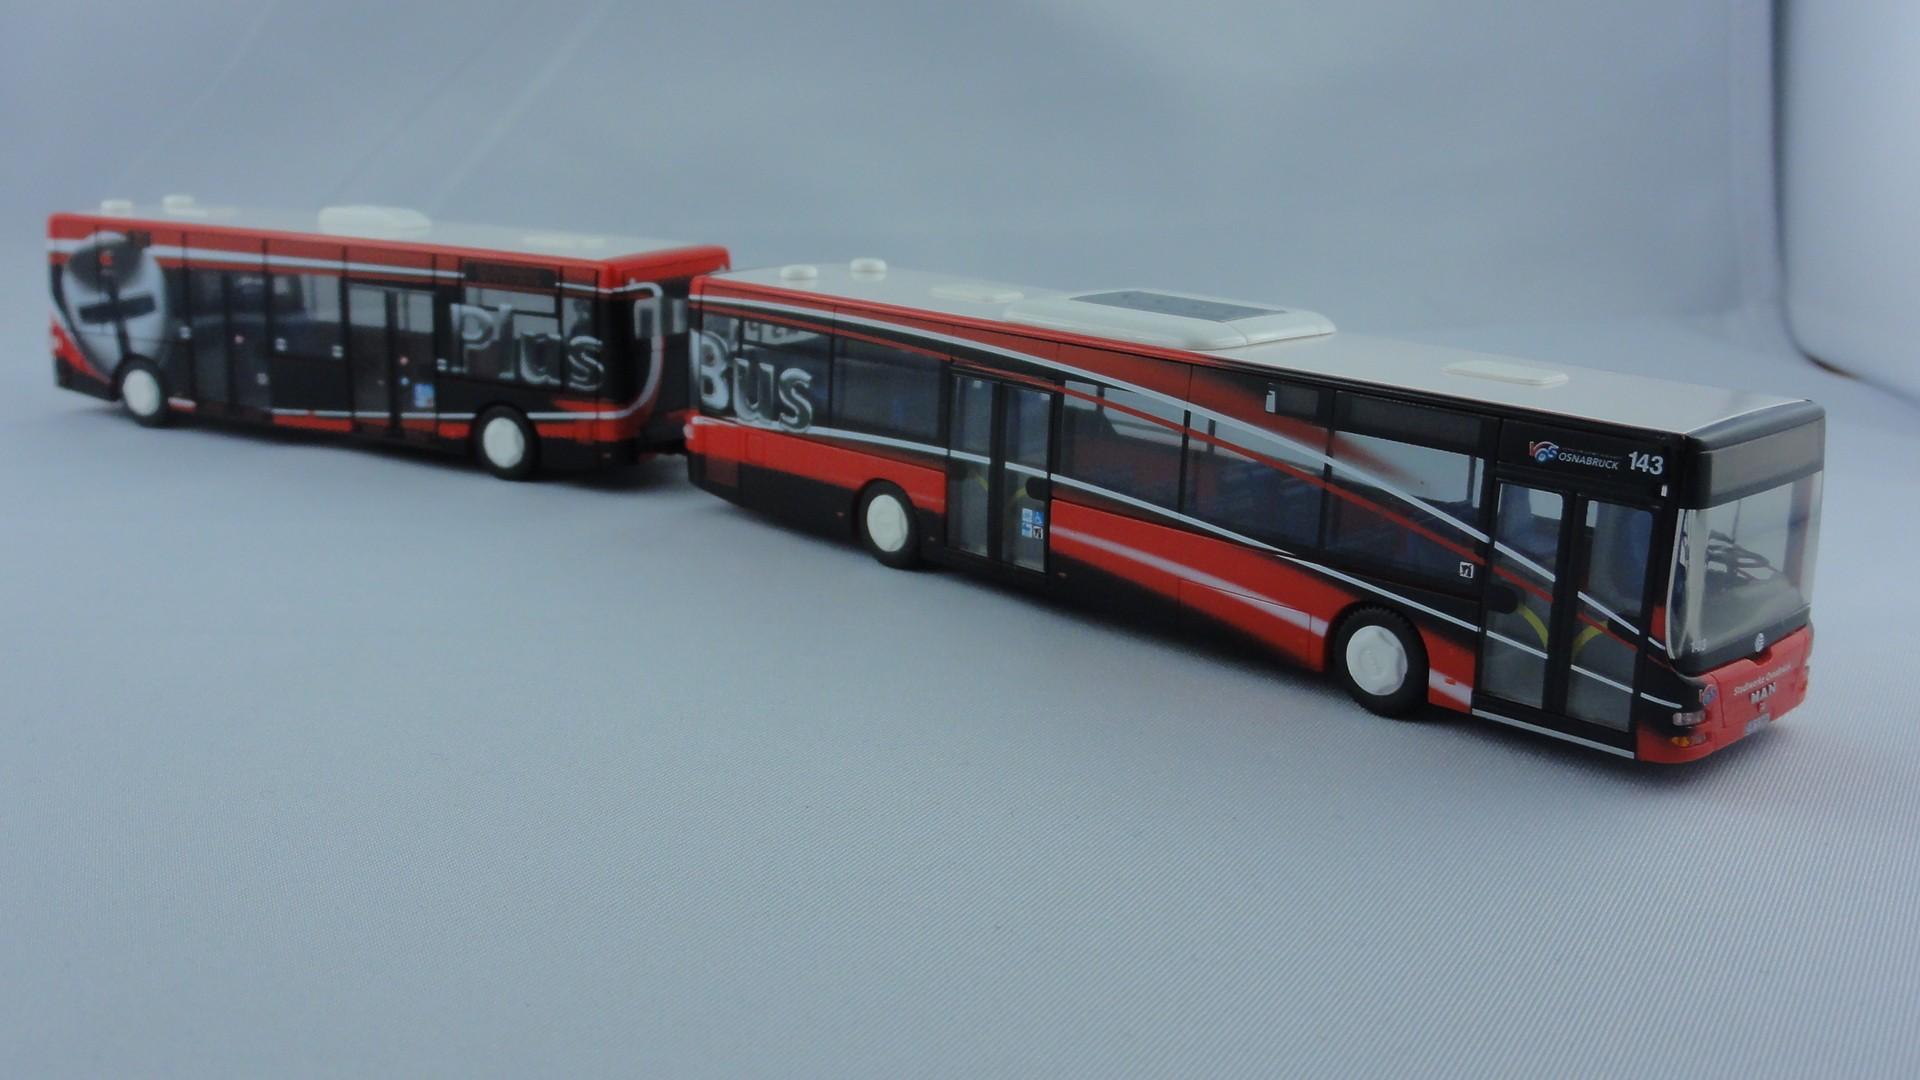 Rietze MAN / Göppel Maxitrain  Plus-Bus VOS Osnabrück Ziel Hochschulen Westerberg